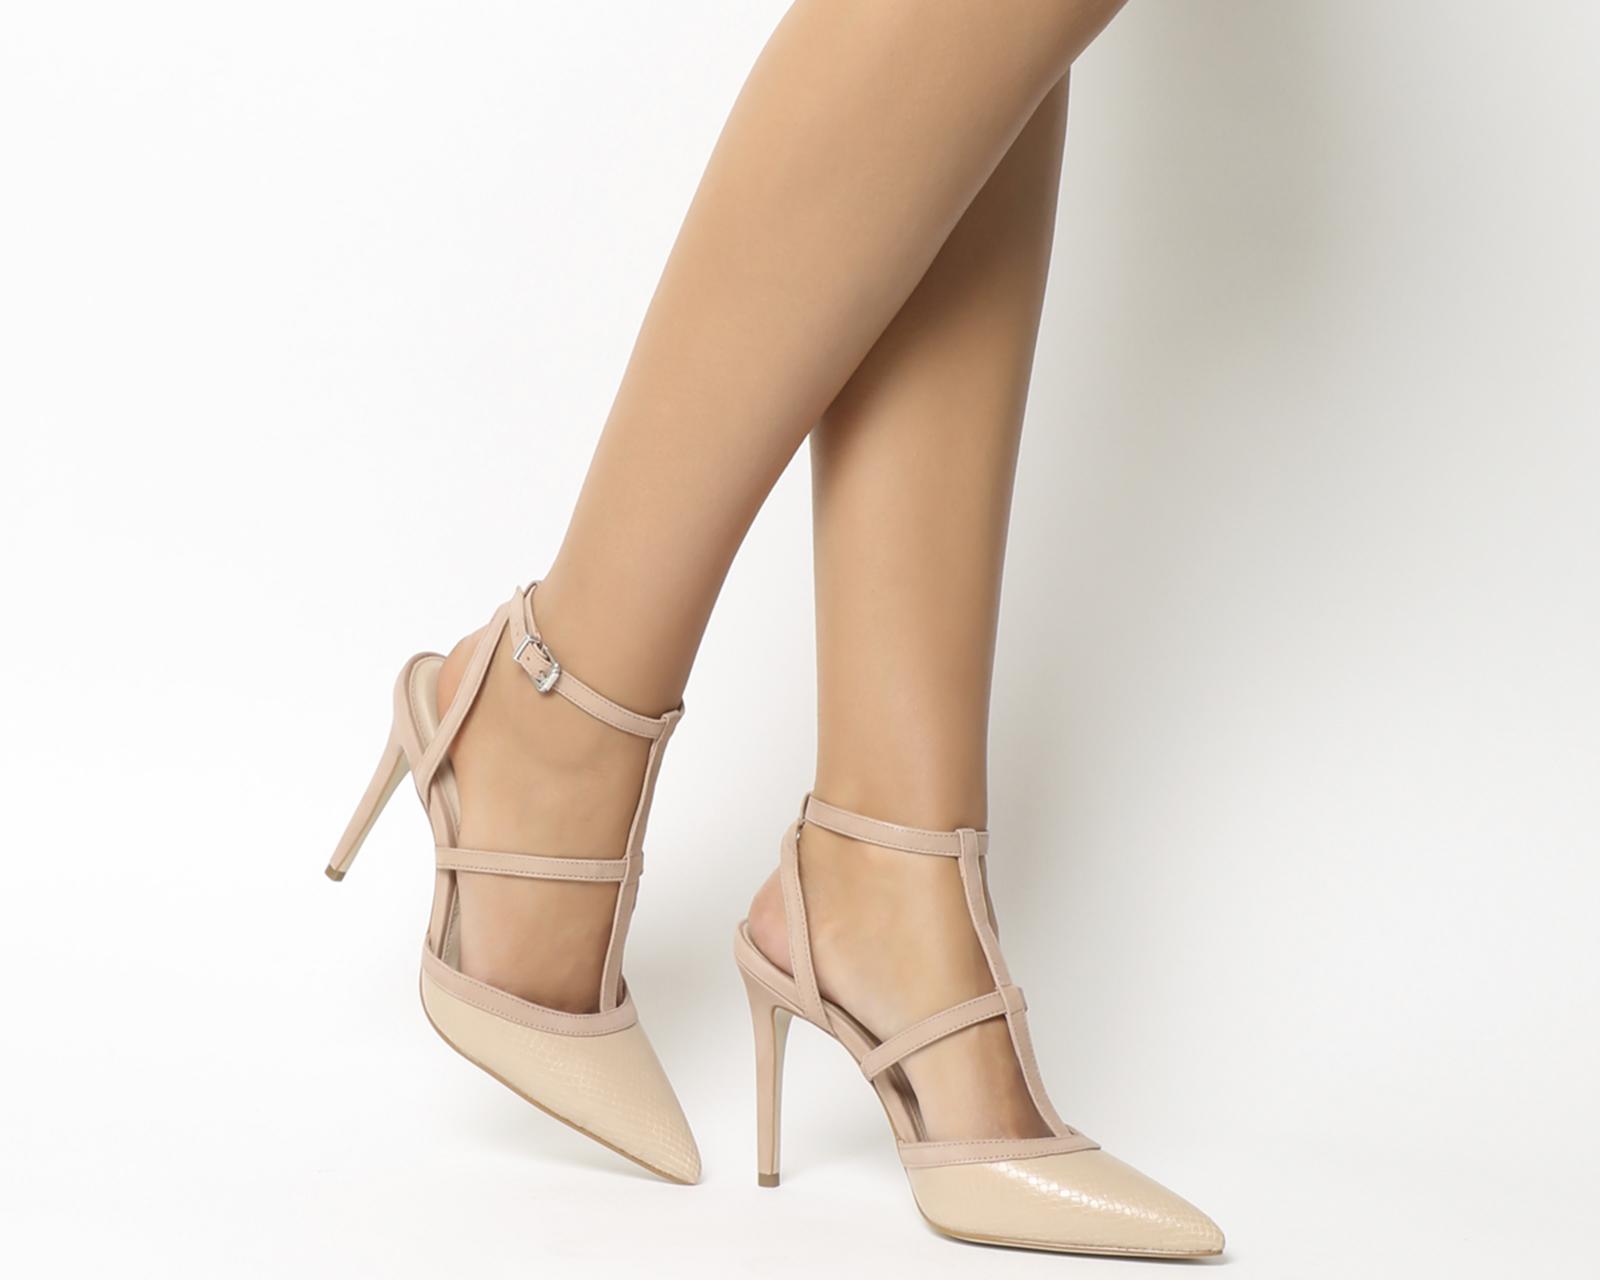 c3d5fc0dd0b Sentinel Womens Office Hey Hey T Bar Point Court Heels Nude Nubuck Natural  Snake Heels